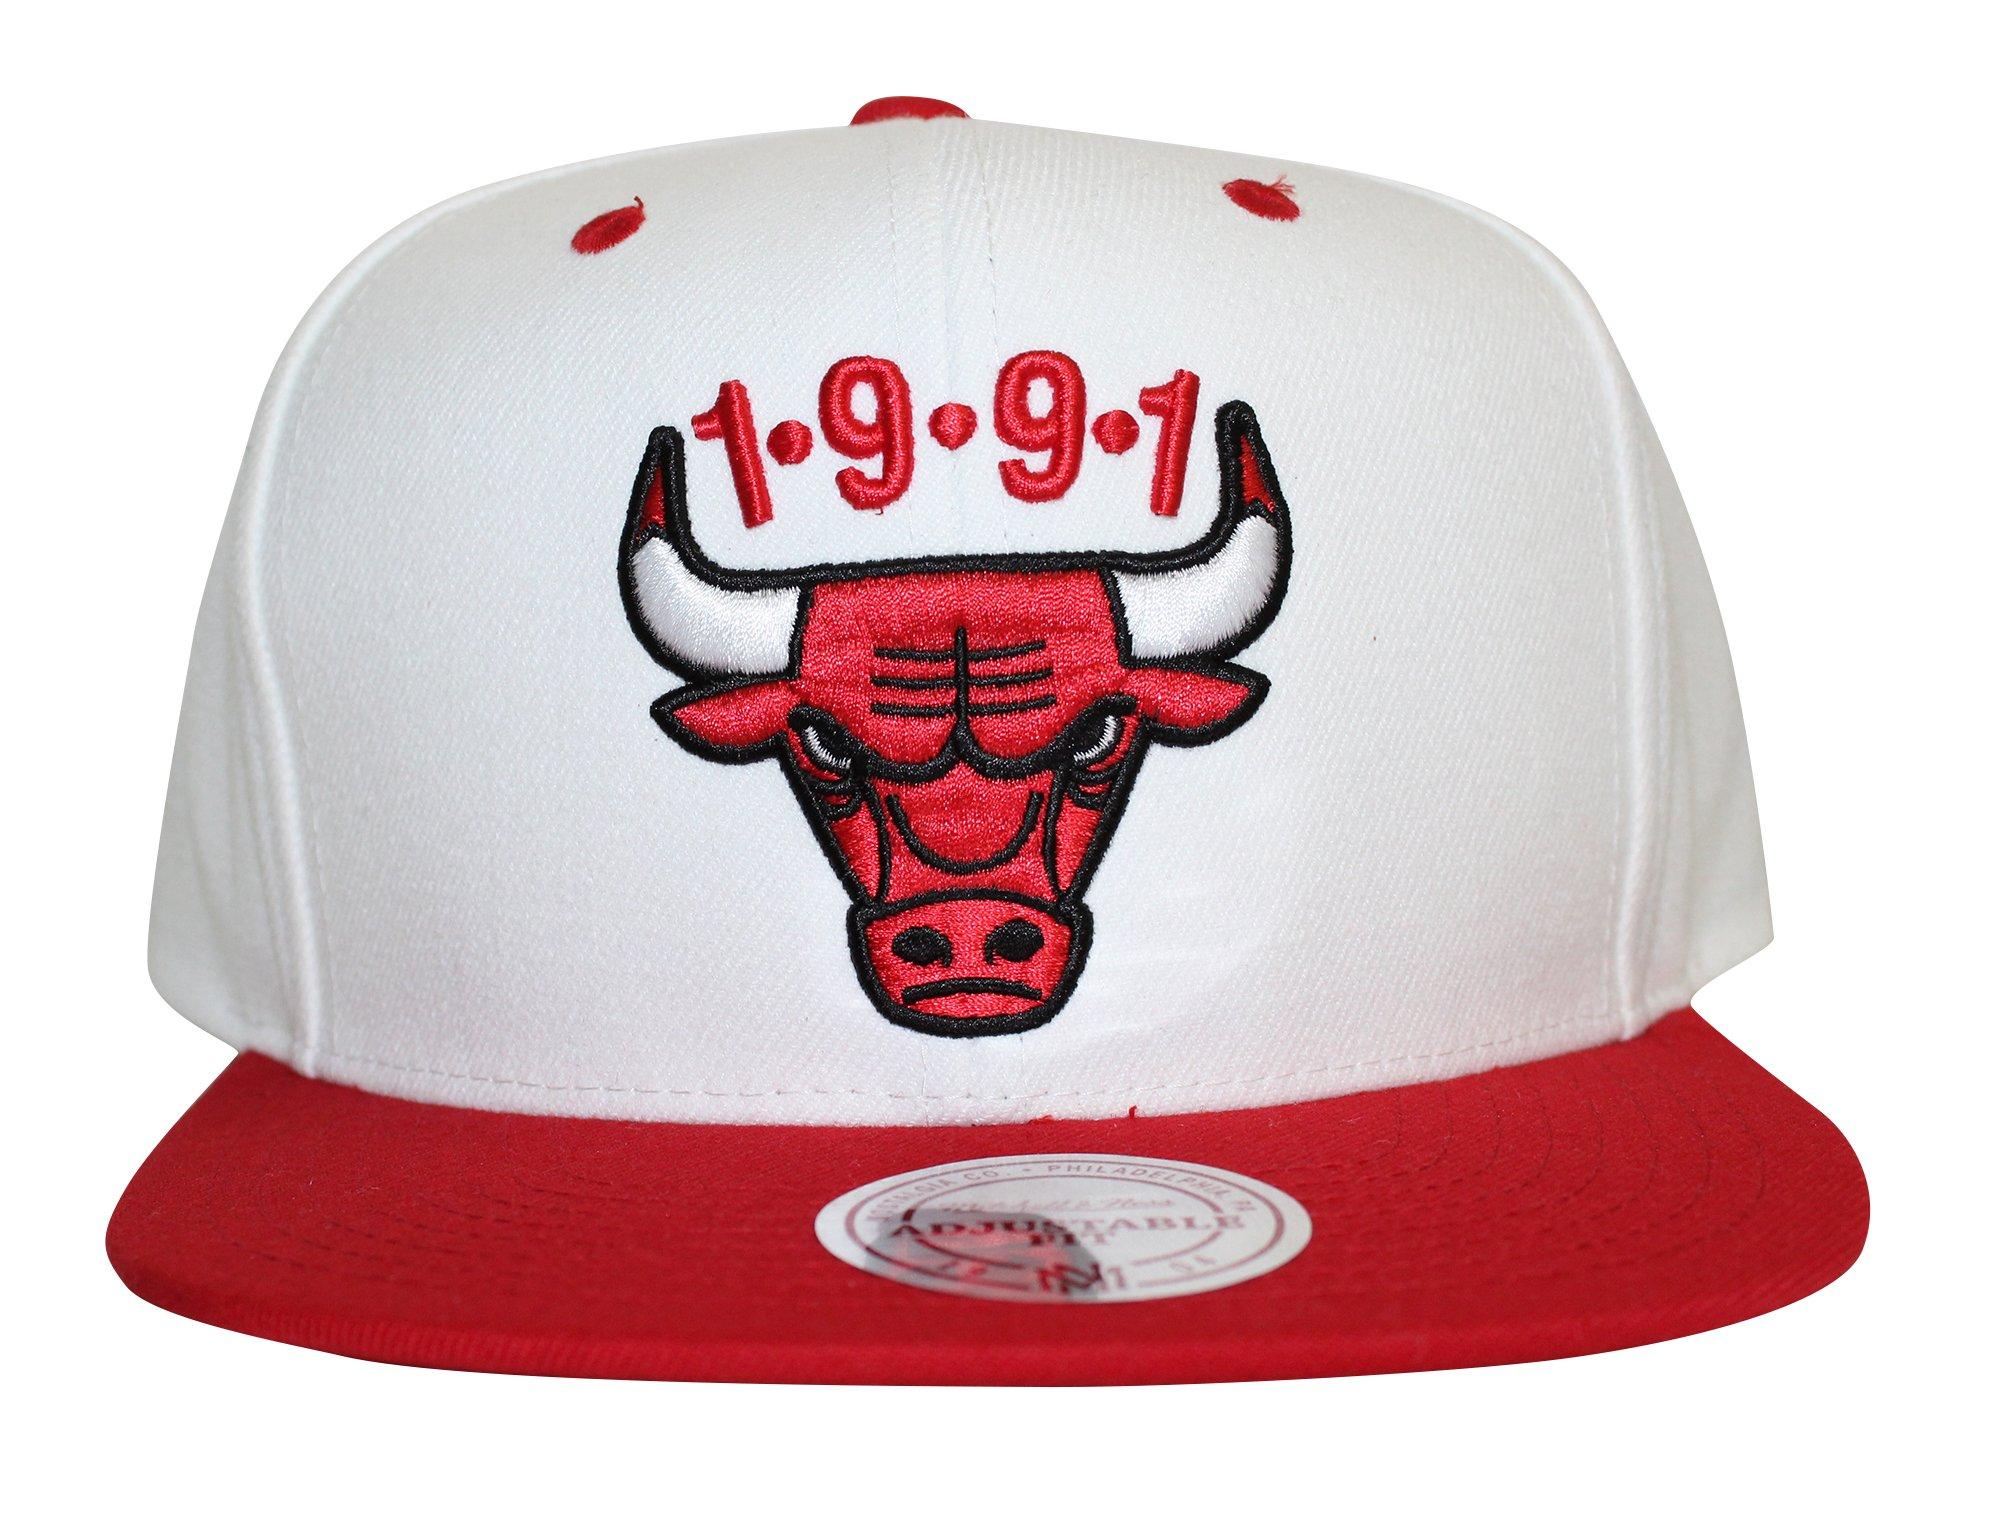 Mitchell & Ness Chicago Bulls NBA 1991 Adjustable Snapback Hat